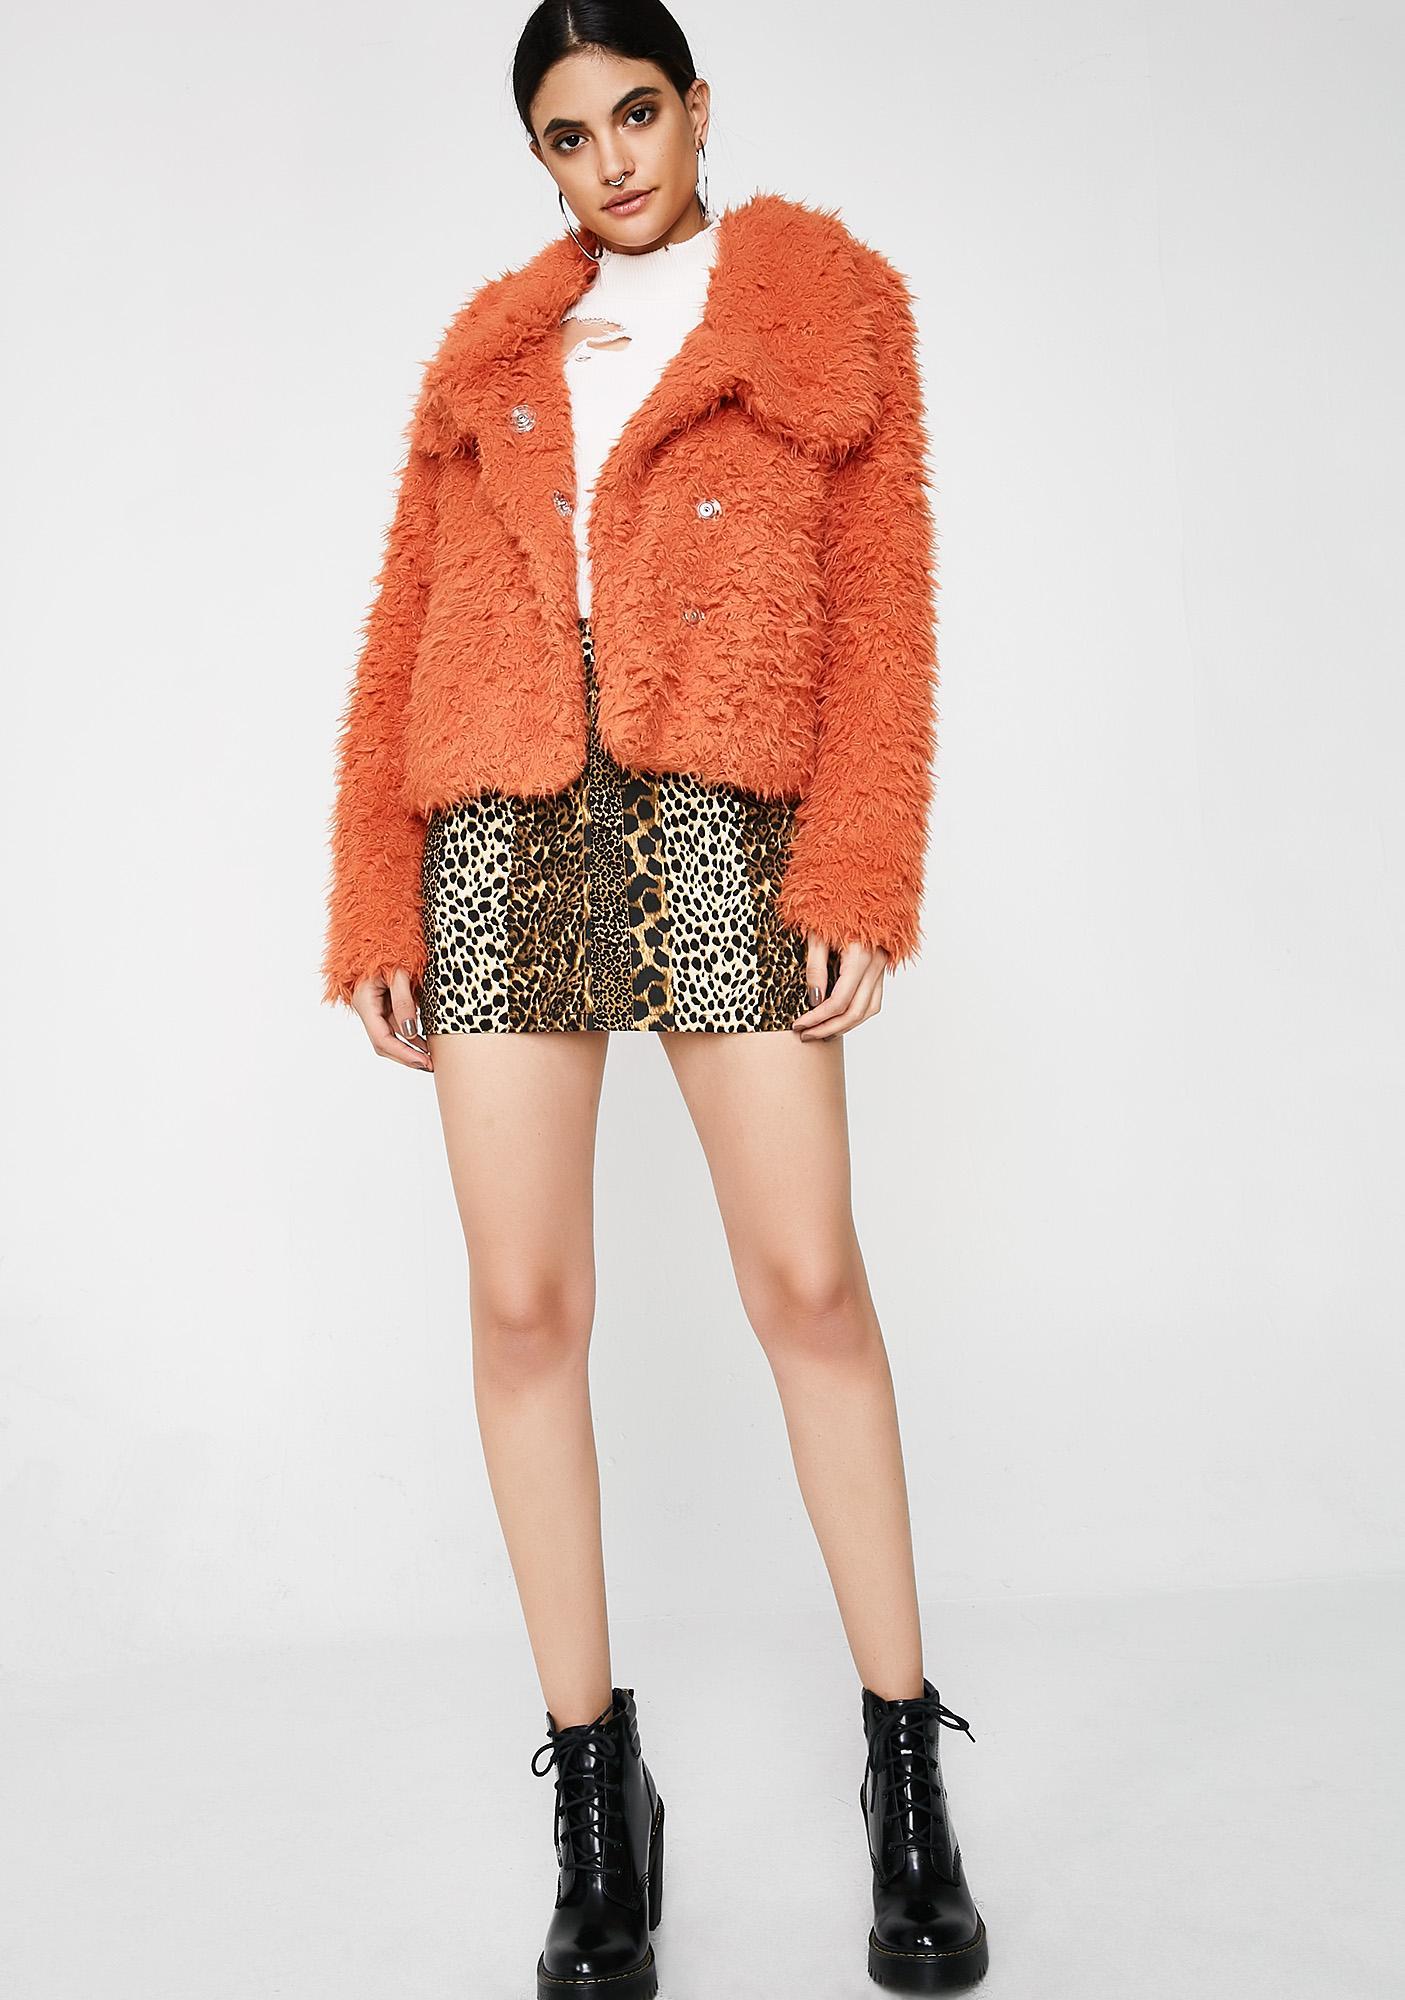 Funky Bright Eyes Fuzzy Jacket